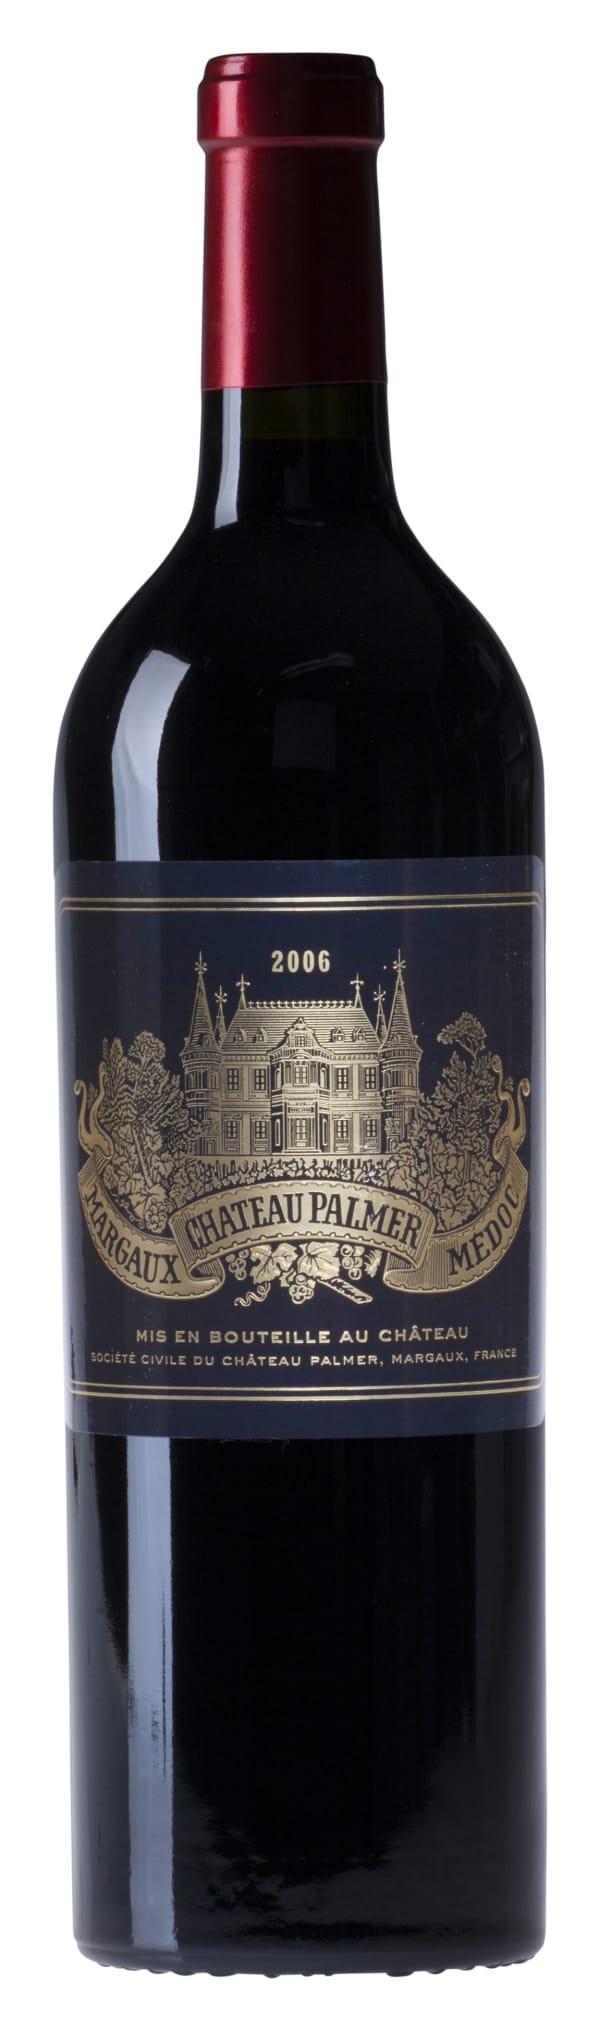 Château Palmer 2008